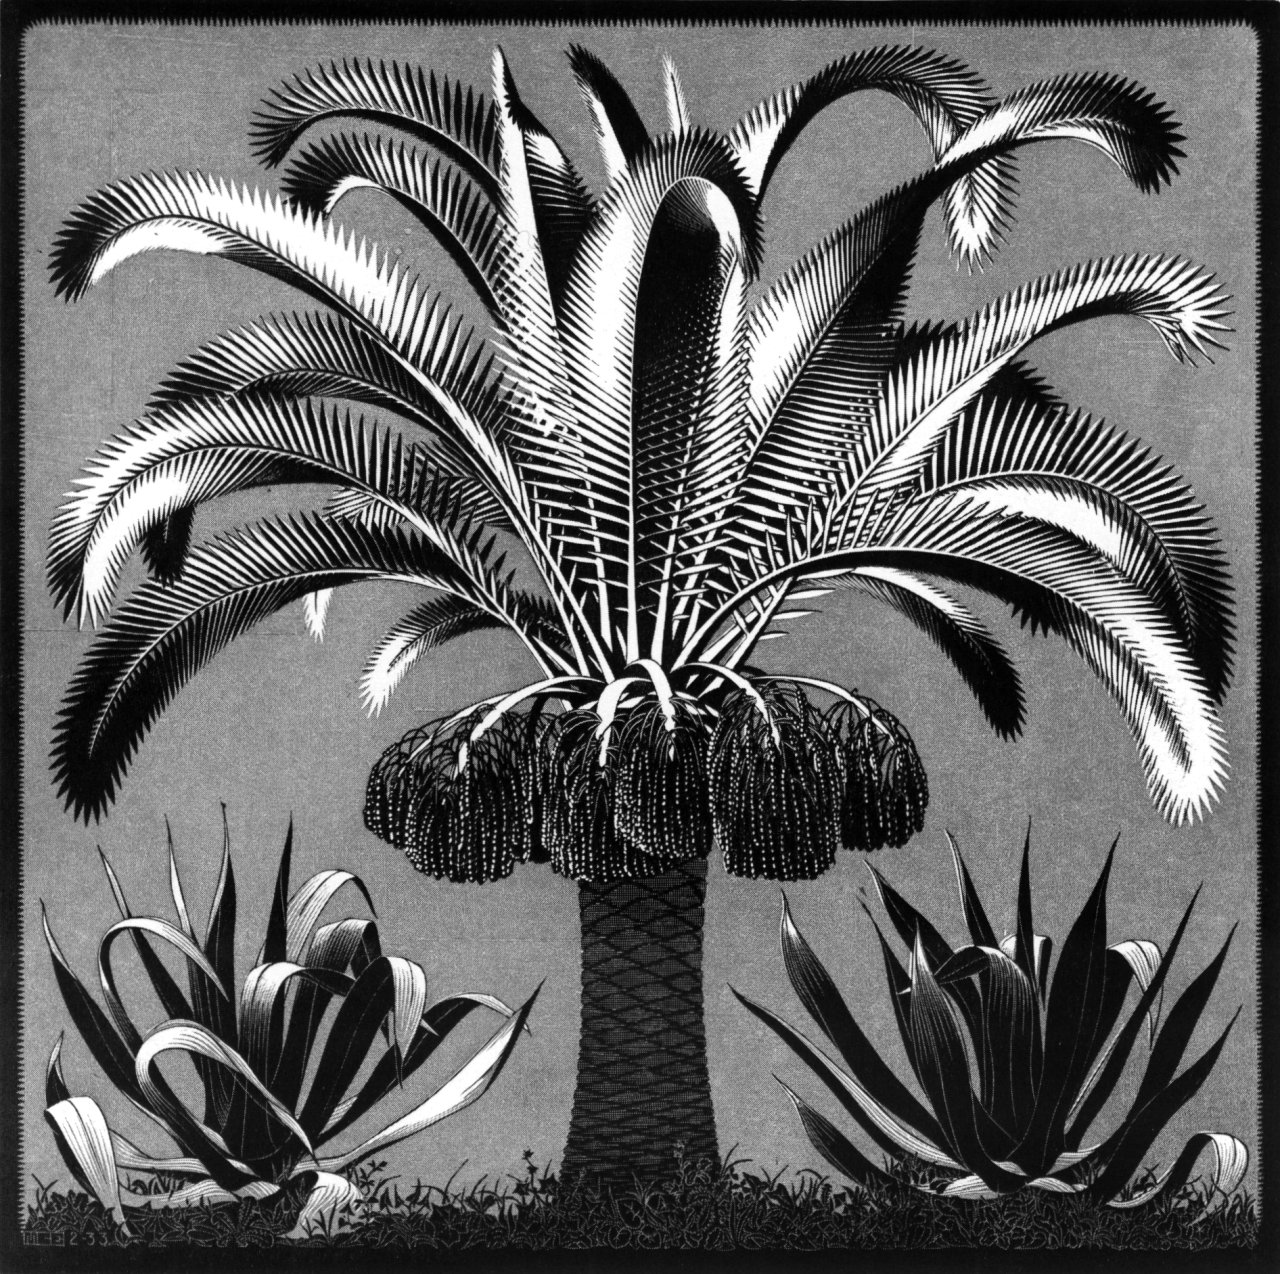 palm 1933 m c escher. Black Bedroom Furniture Sets. Home Design Ideas